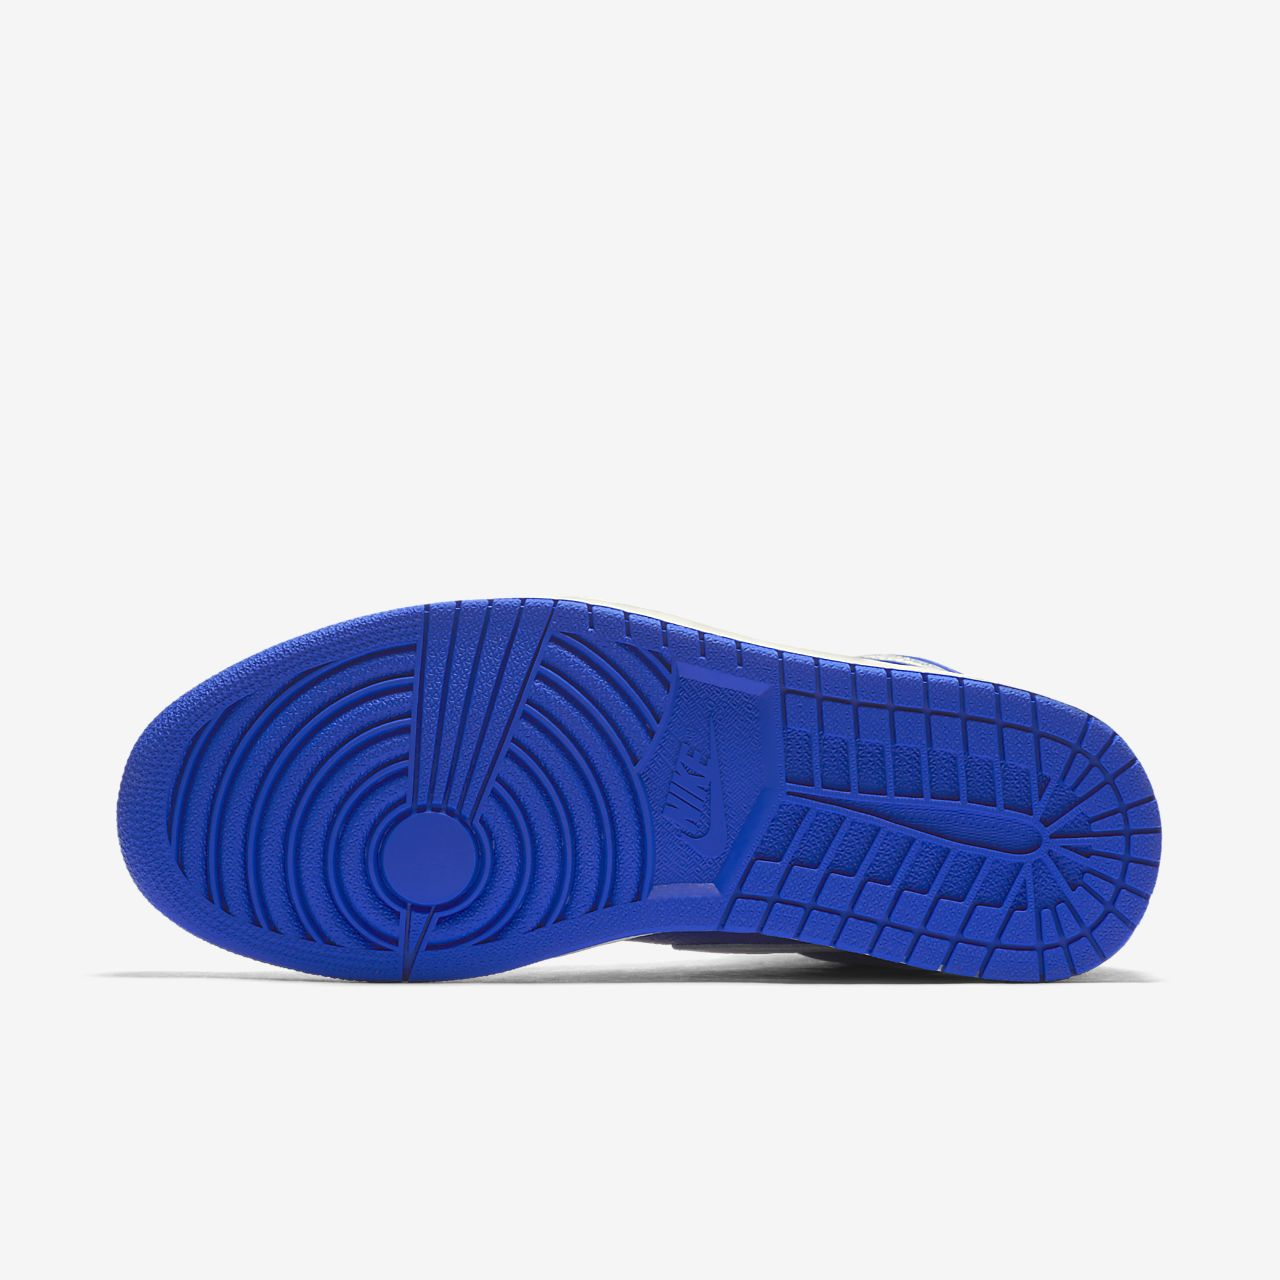 new styles 45475 38b4b ... Air Jordan 1 Retro High OG Shoe